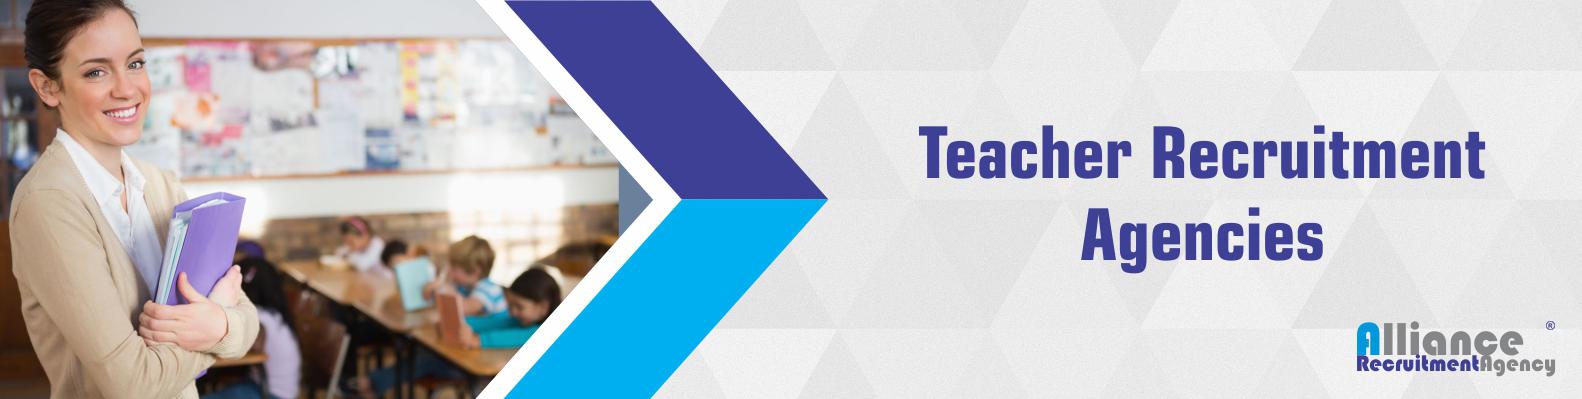 Teacher Recruitment Agencies  - Education Recruitment Agencies